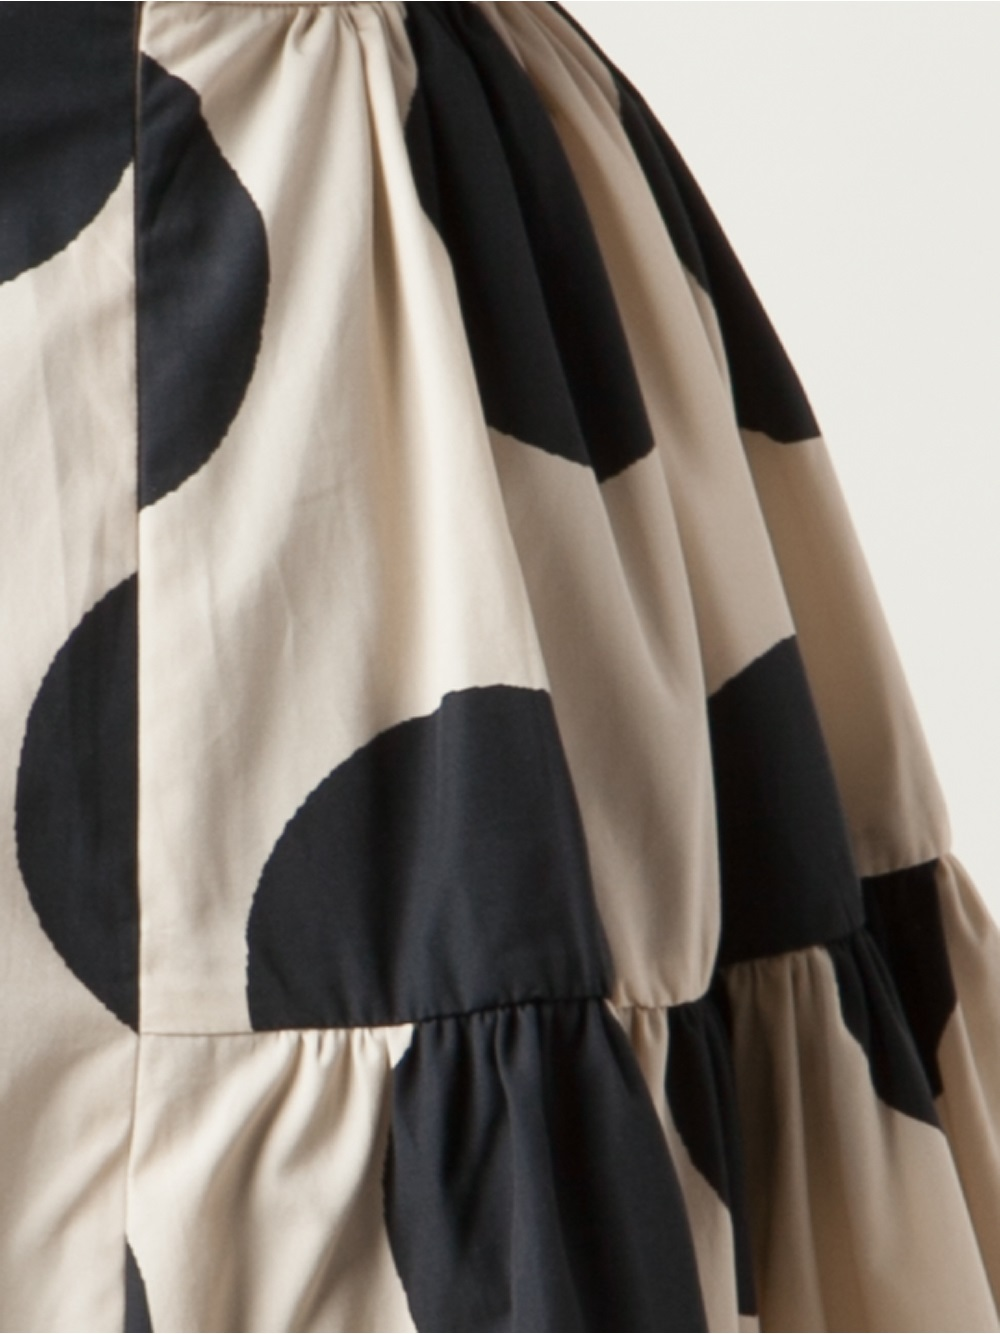 Marni Polka Dot Skirt - Capitol - Farfetch.com